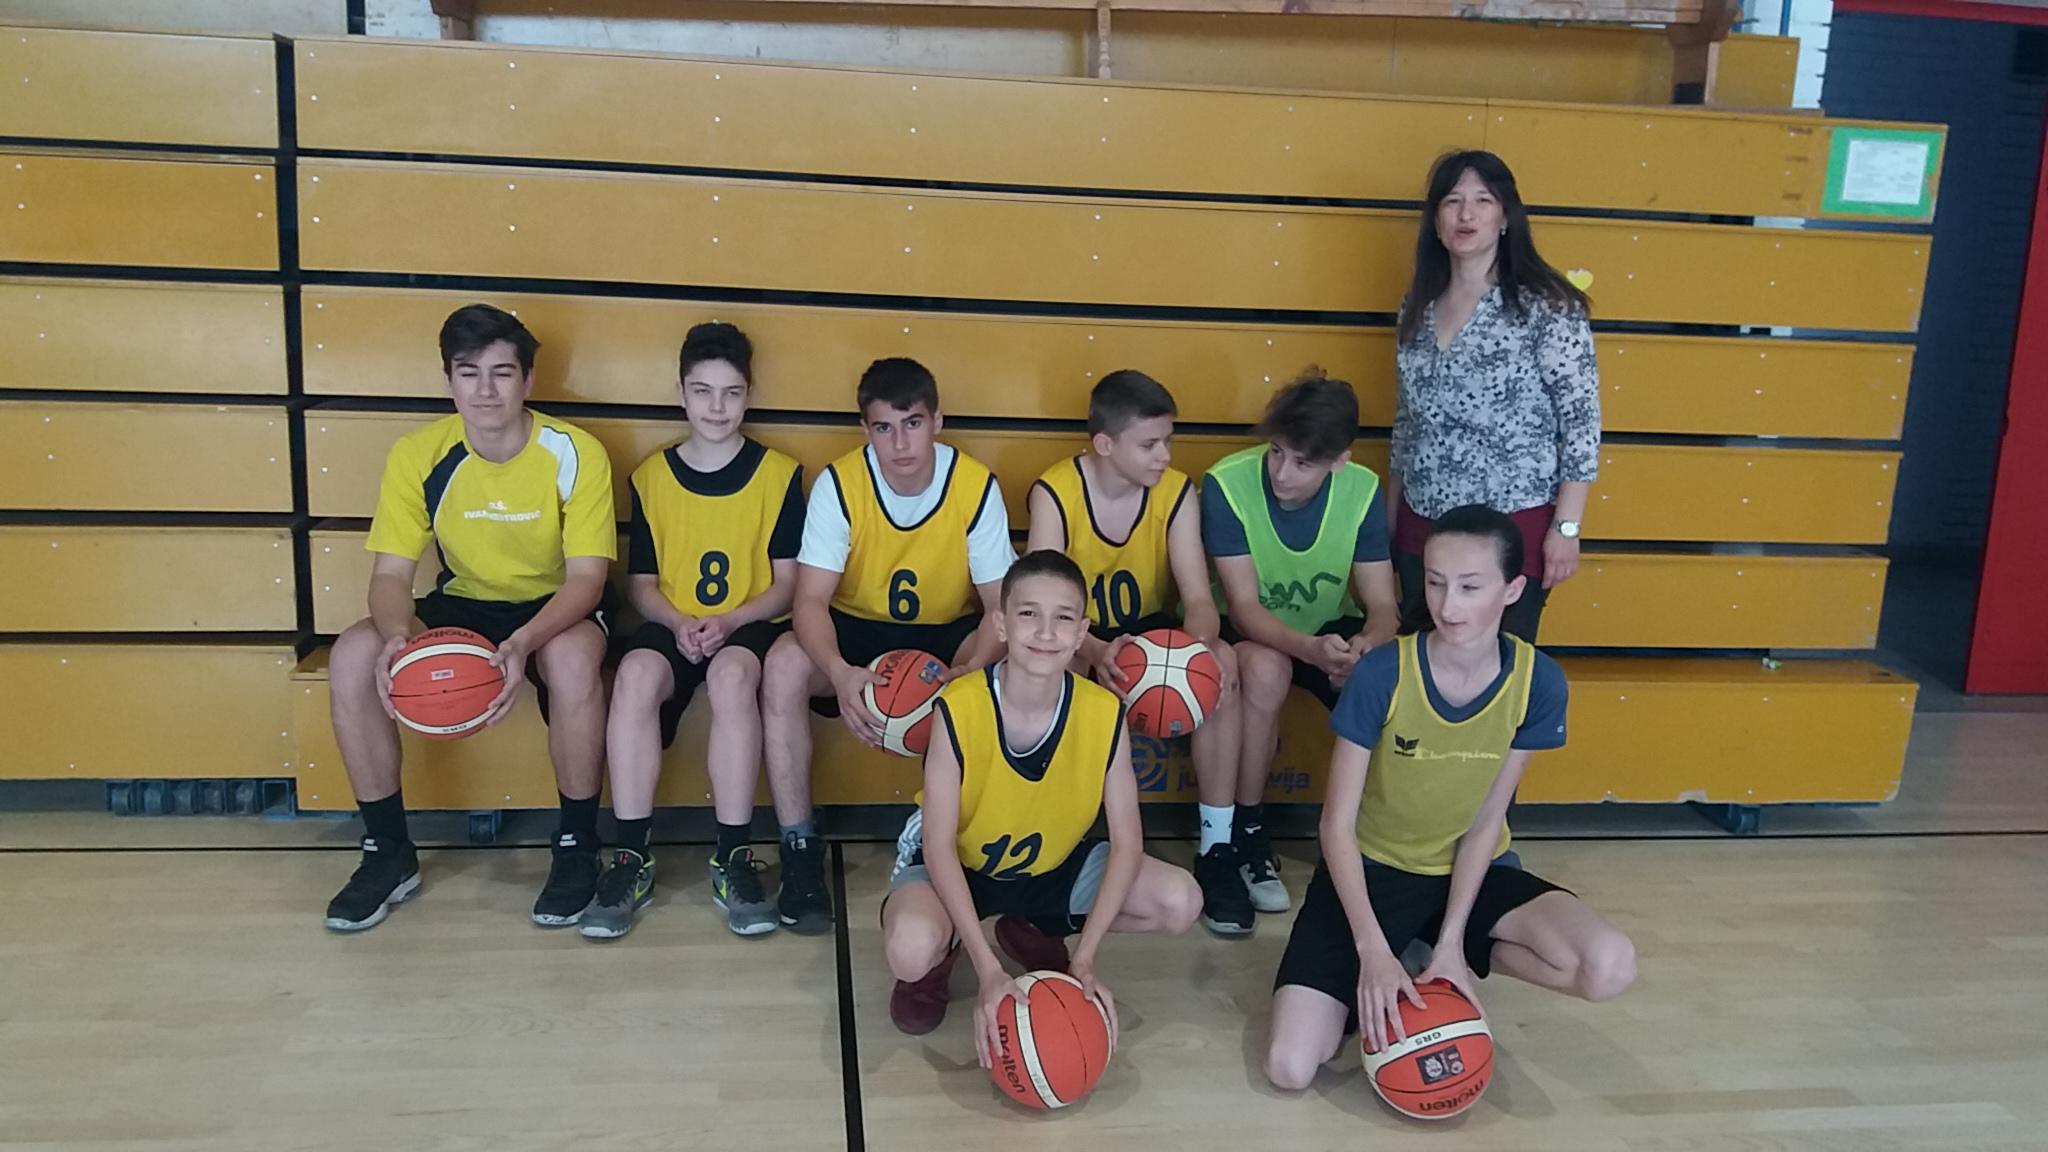 Osnovna Skola Ivana Mestrovica Zagreb Vikendom U Sportske